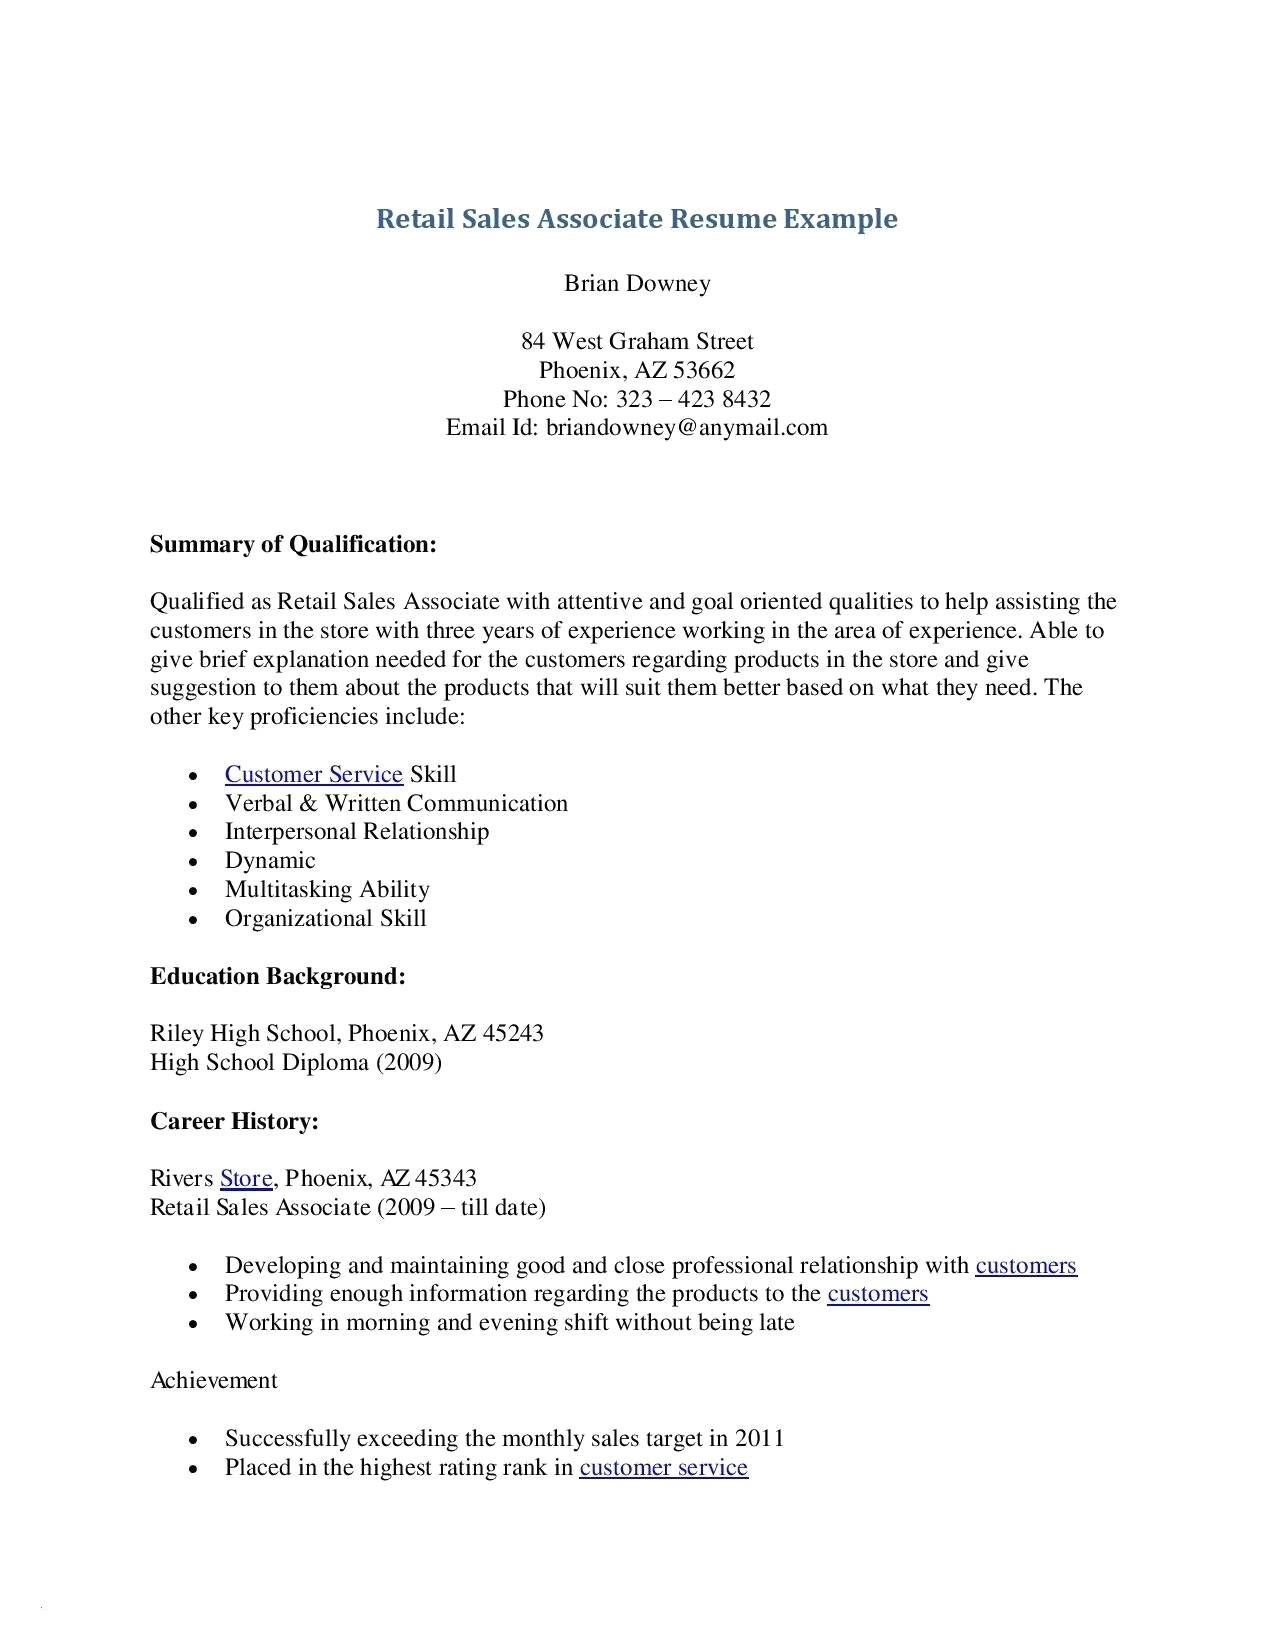 Resume Template No Experience Retail